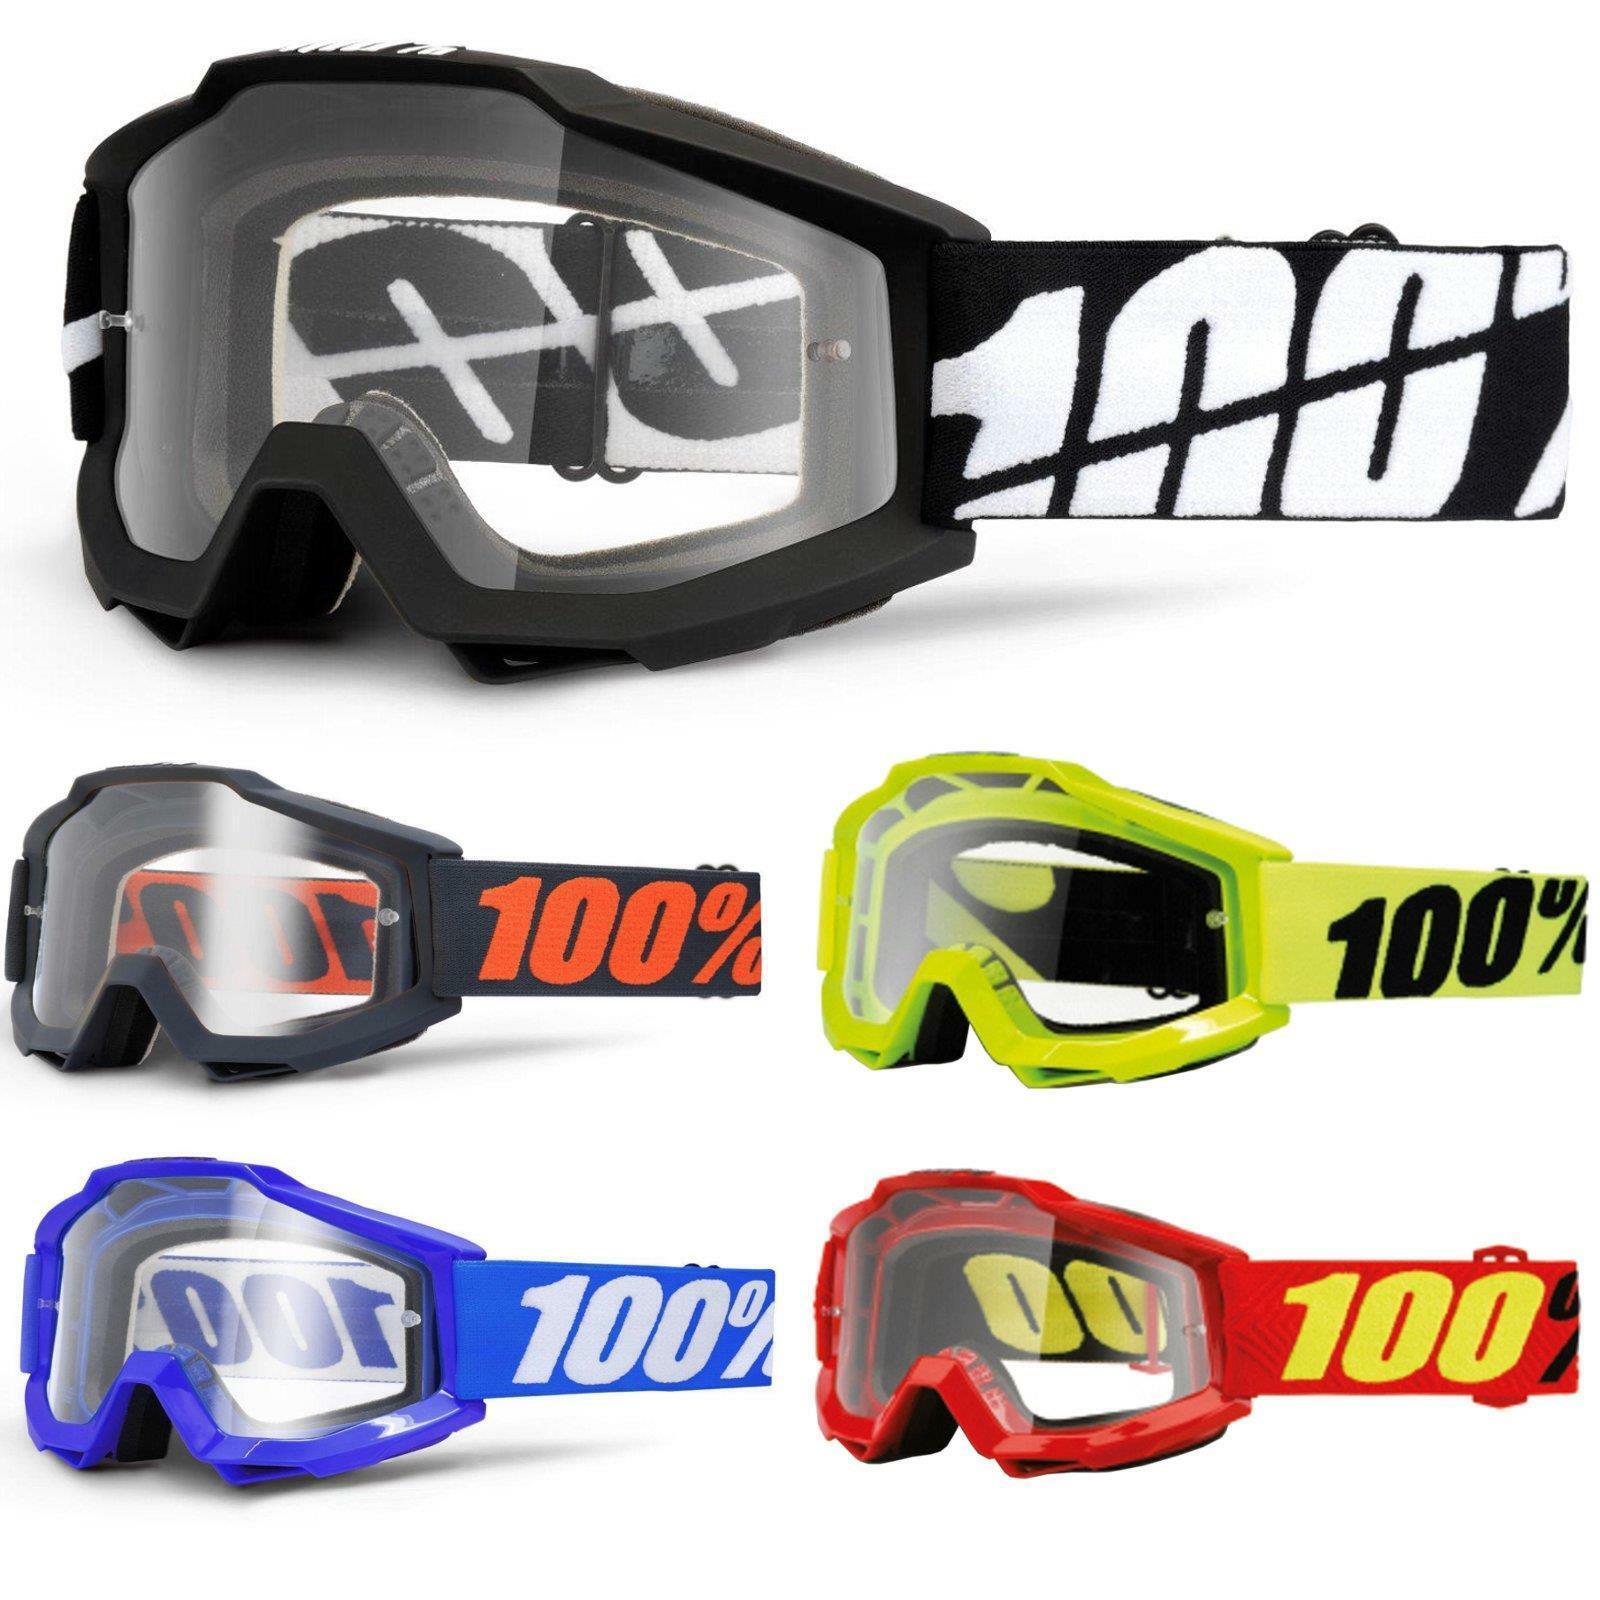 100% por ciento accuri OTG Goggle gafas claramente DH MTB MX downhill para gafas